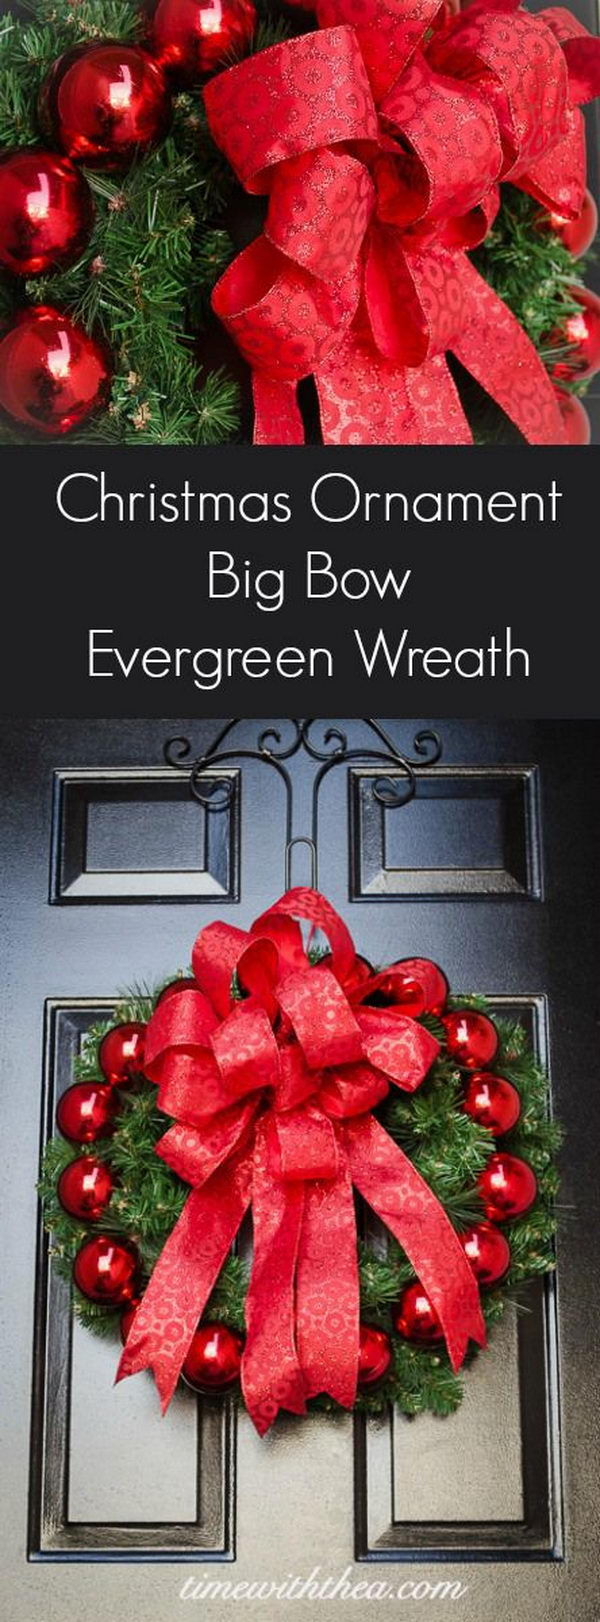 DIY Christmas Ornament Big Bow Evergreen Wreath